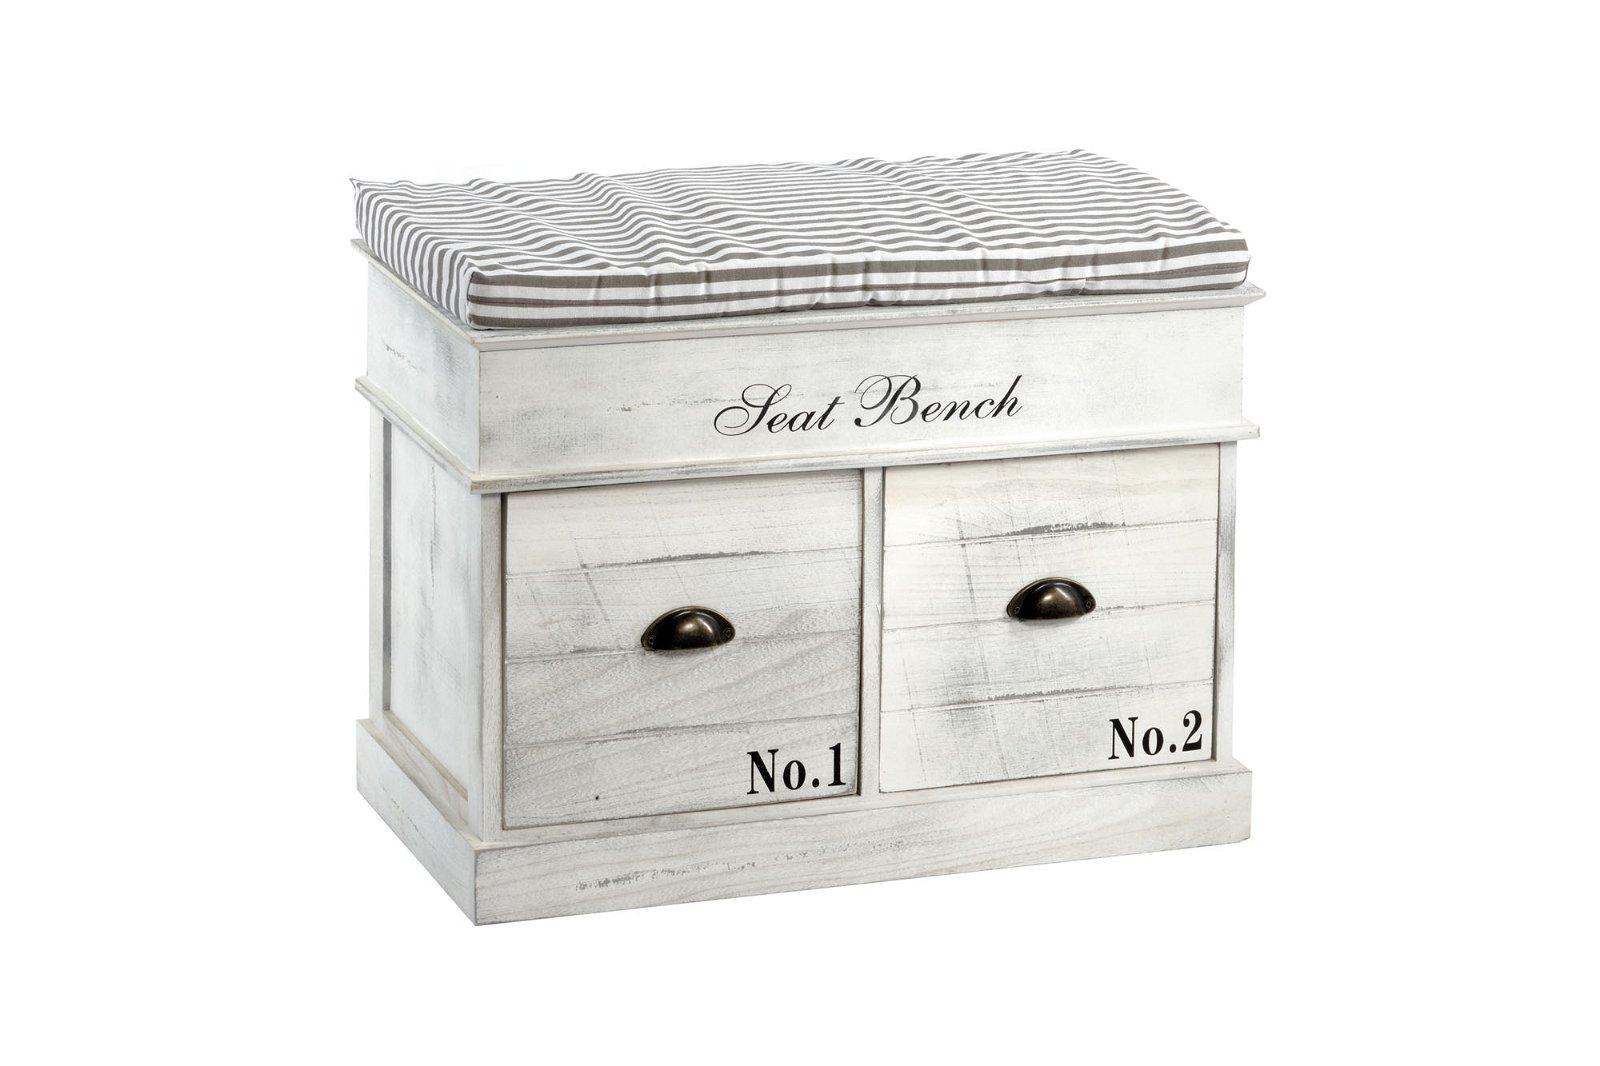 White Wood Seat Bench 2 Drawers 70 x 35 x 50cm